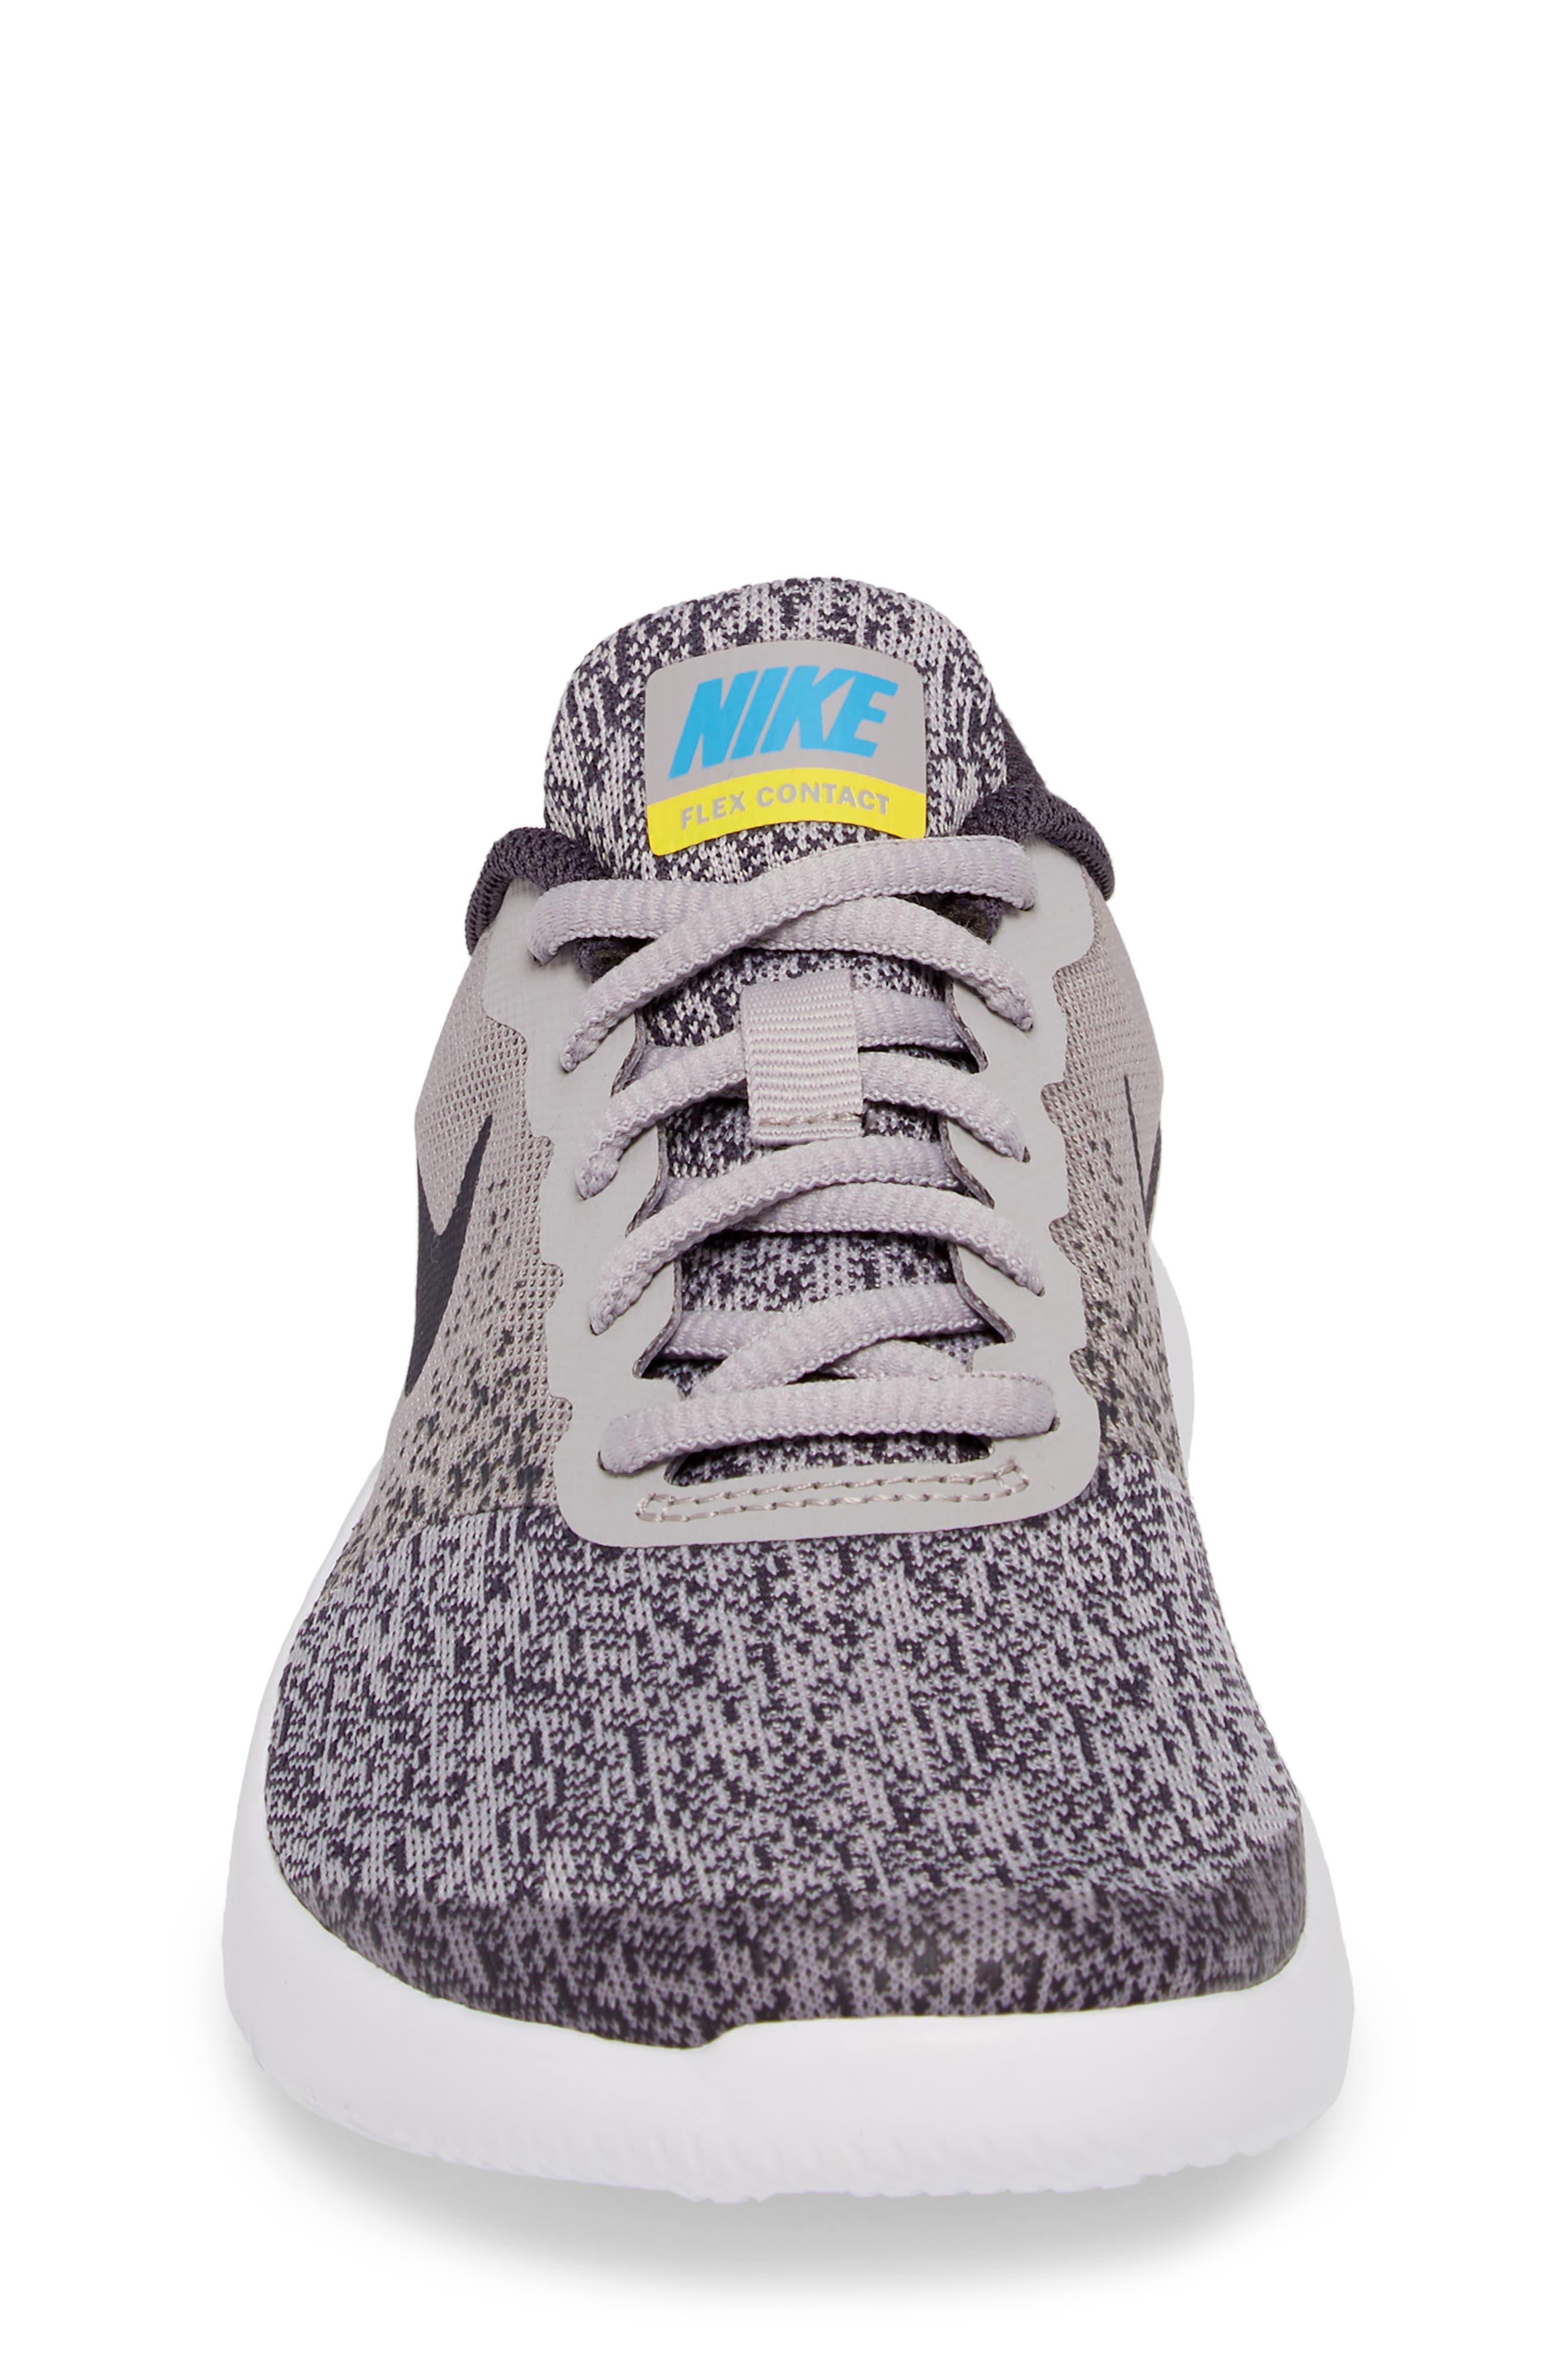 Flex Contact Running Shoe,                             Alternate thumbnail 4, color,                             ATMOSPHERE GREY/ LASER ORANGE